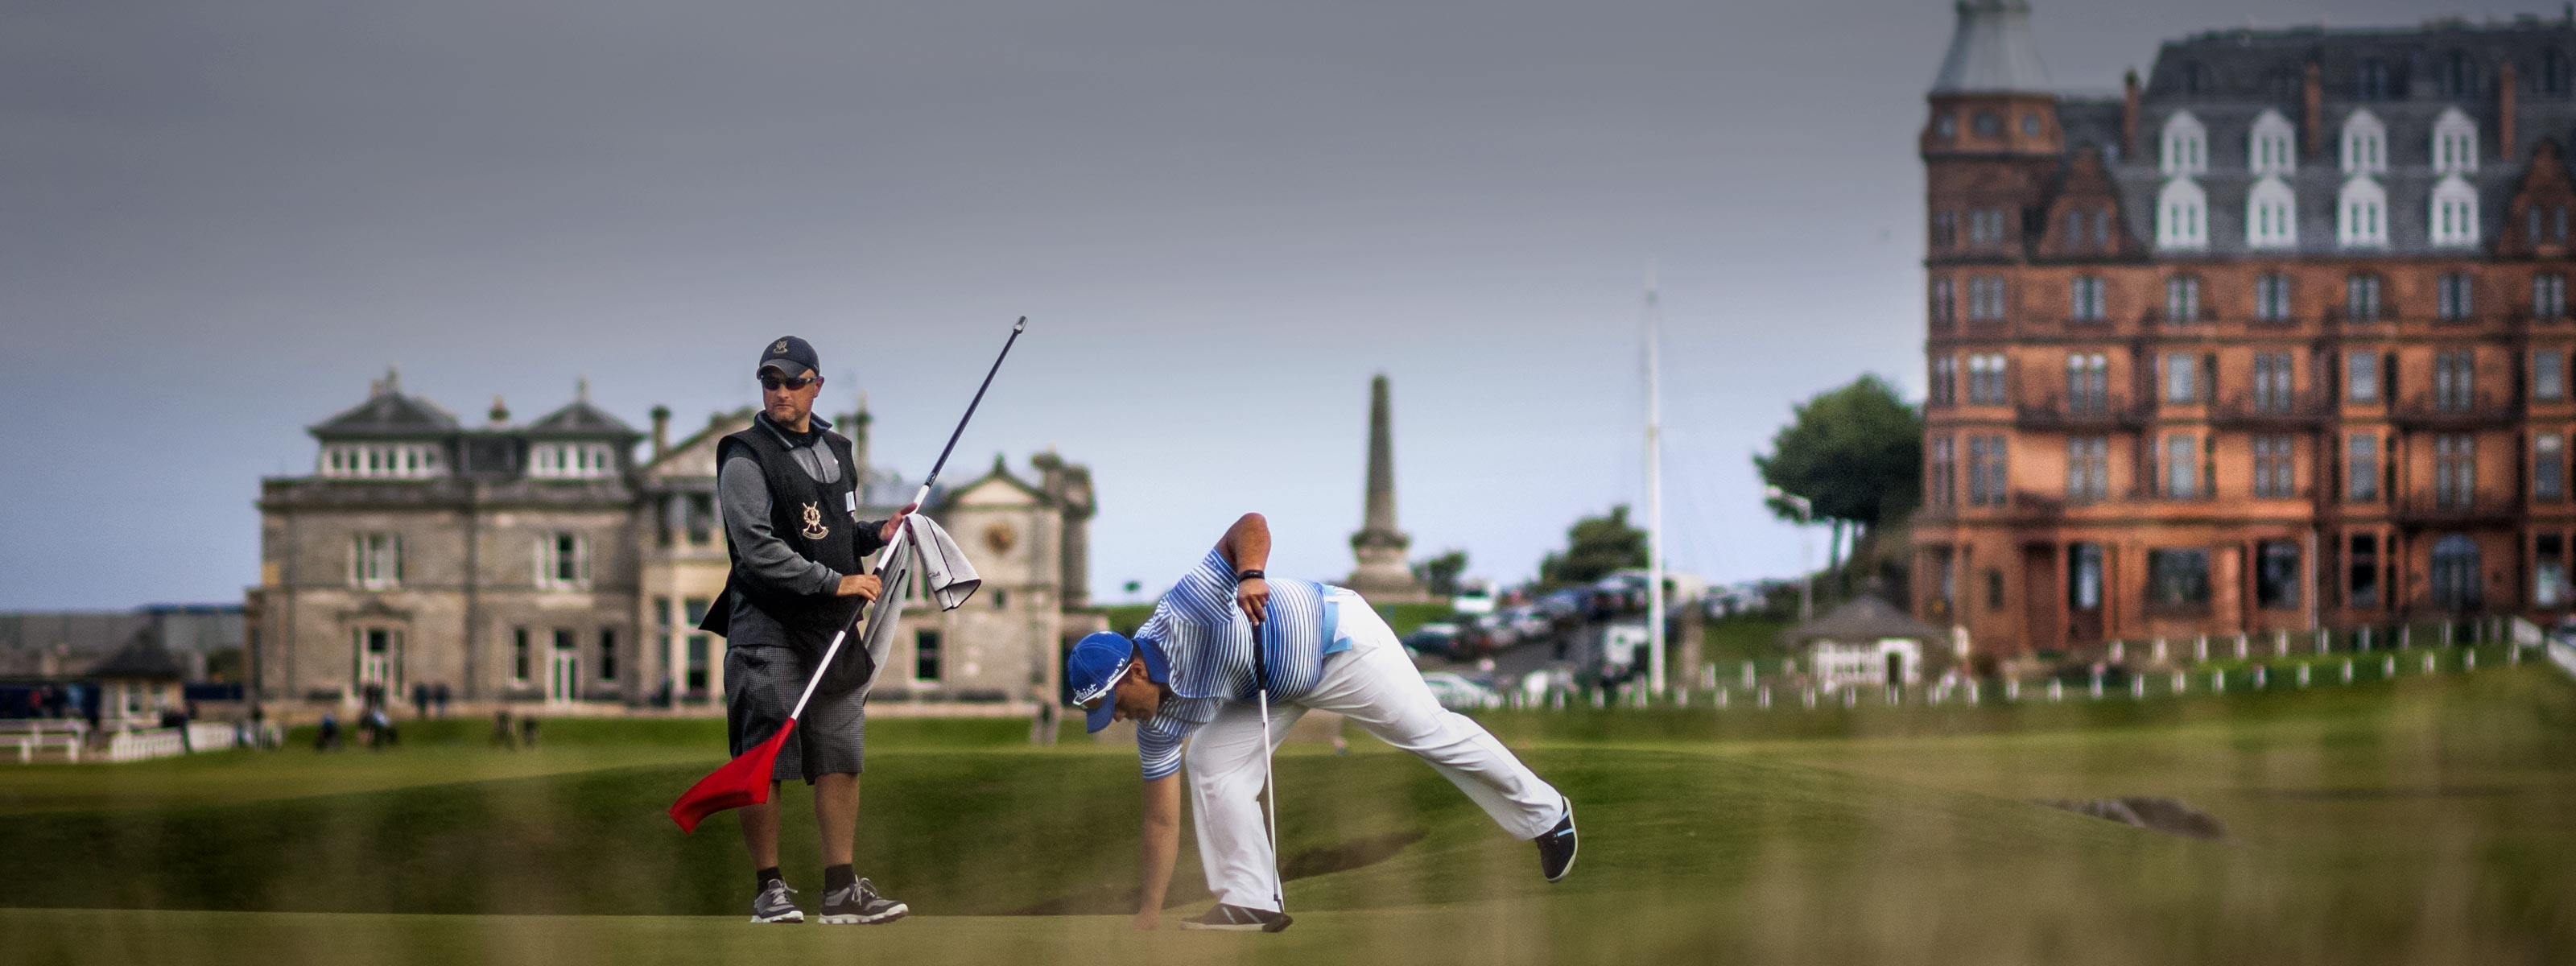 St Andrews - Bonnie Wee Golf